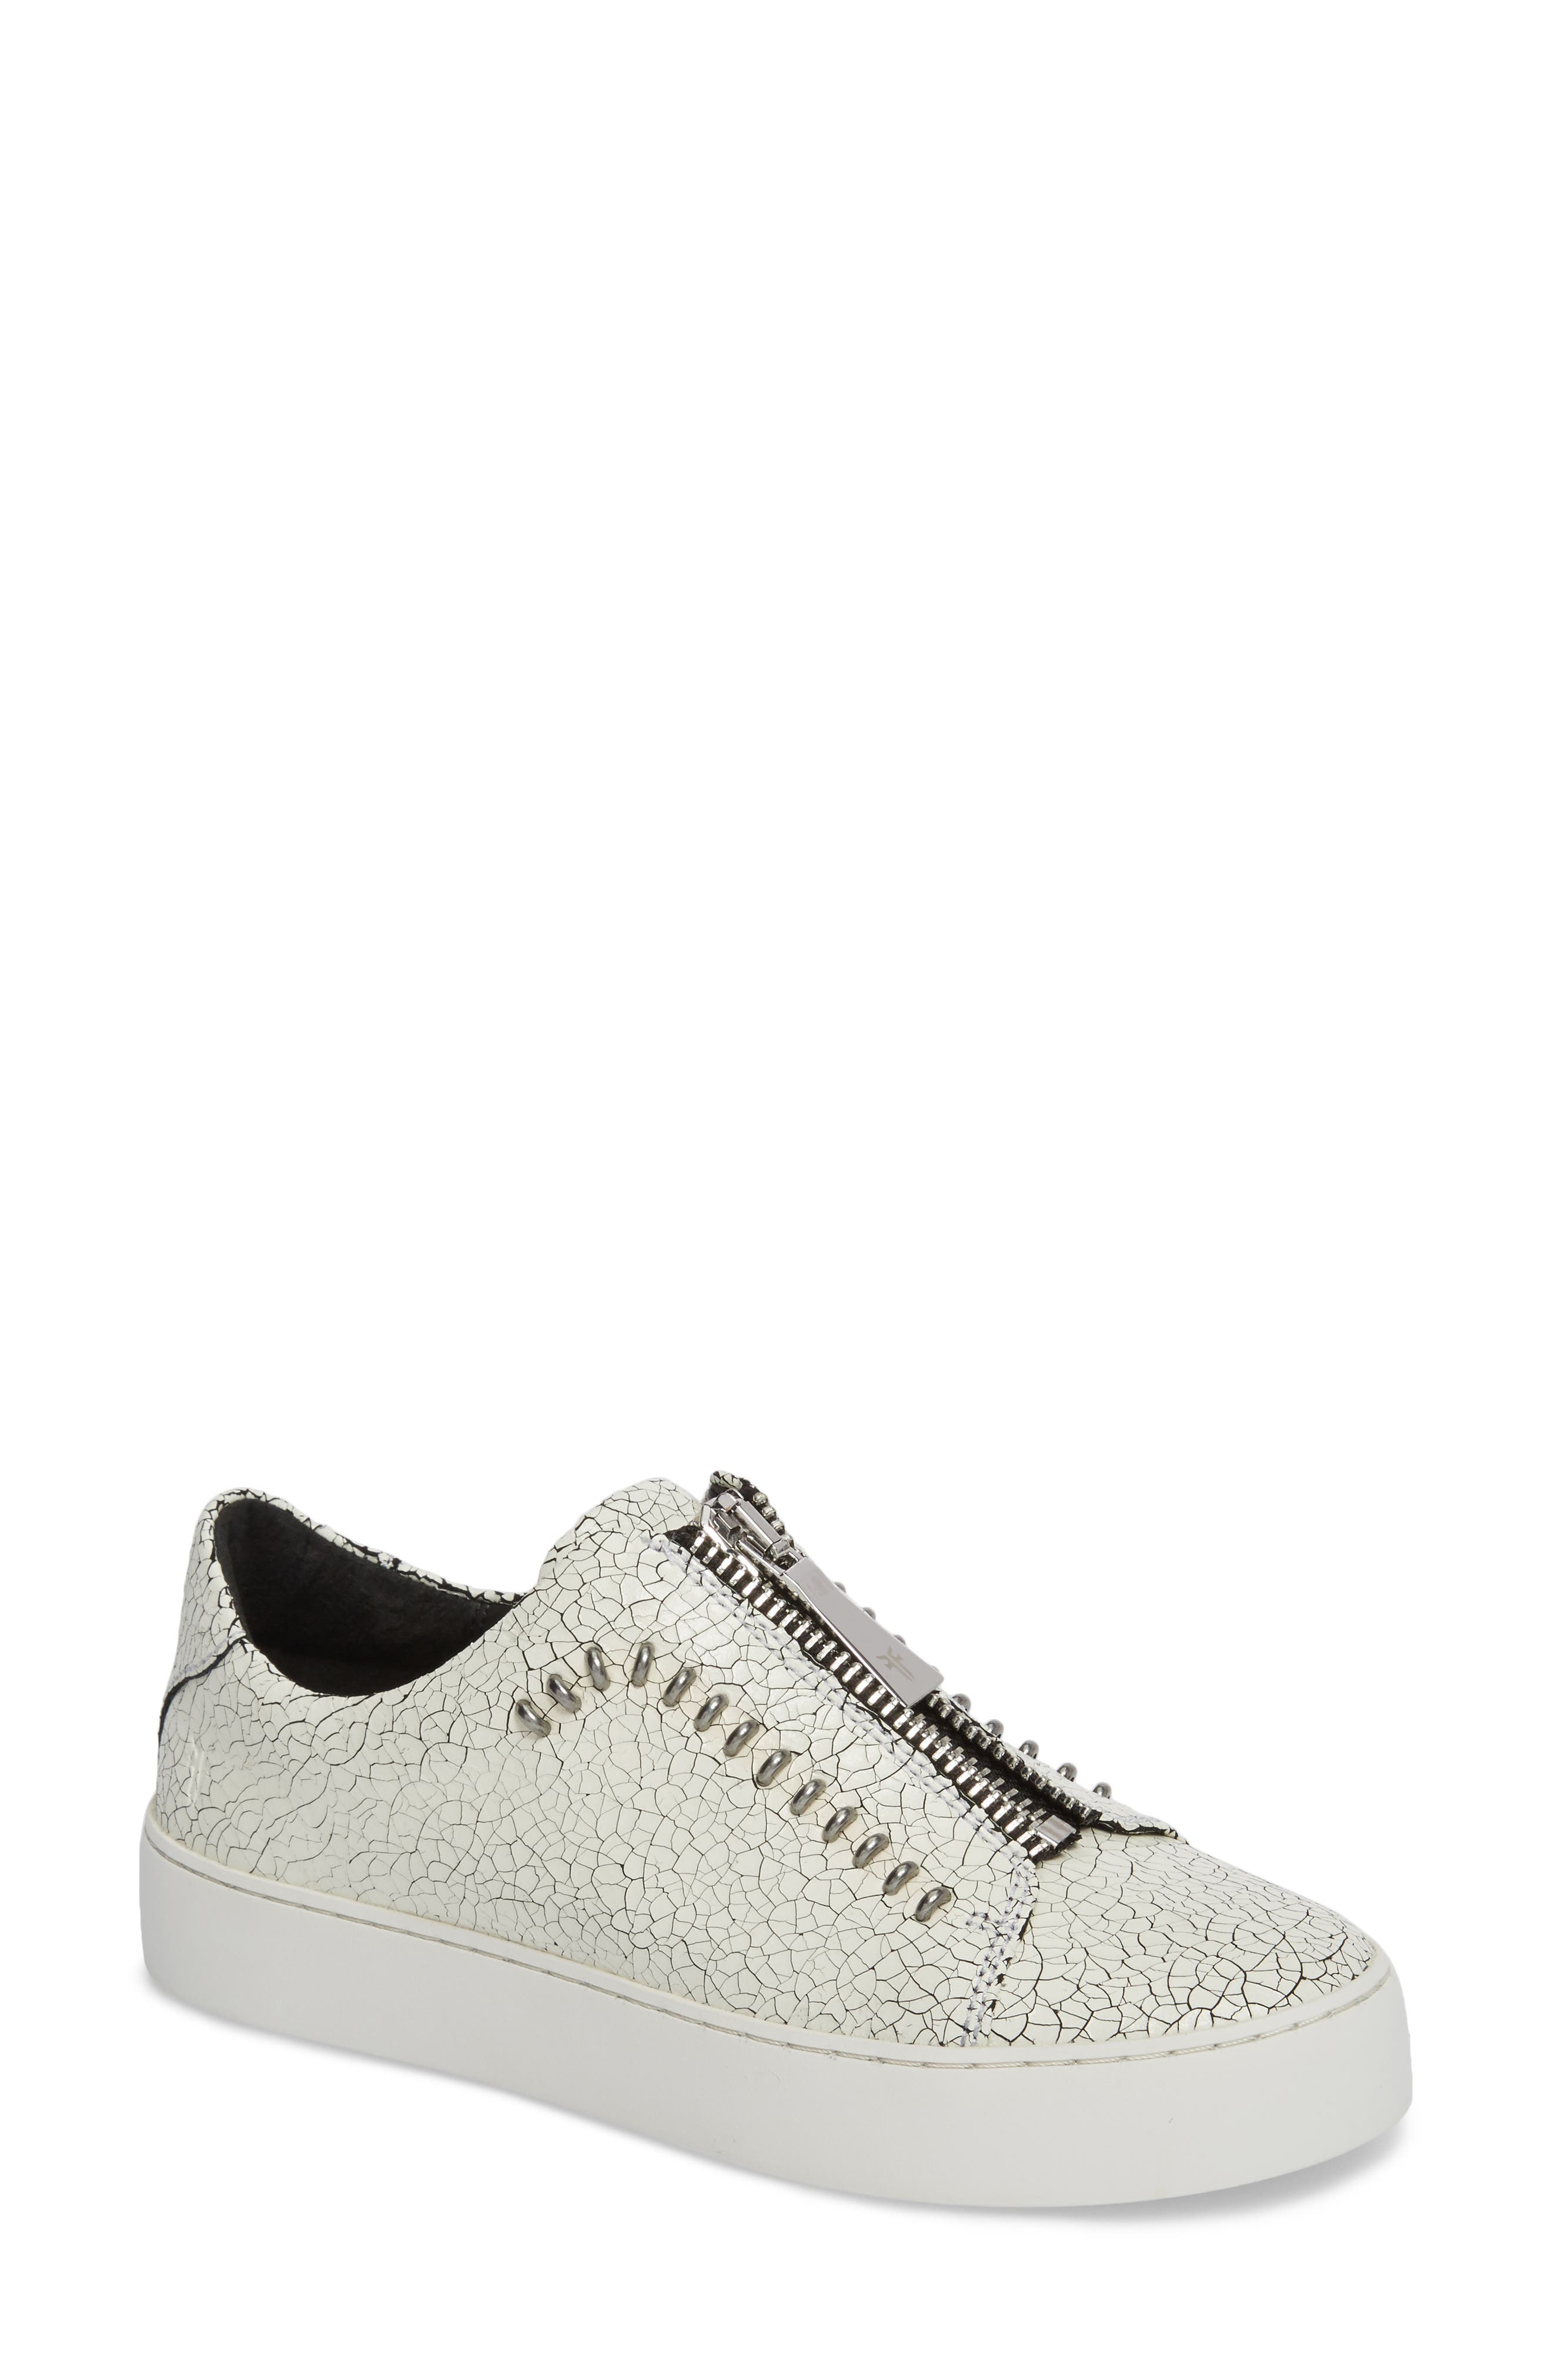 Lena Rebel Zip Sneaker,                             Main thumbnail 1, color,                             White Leather